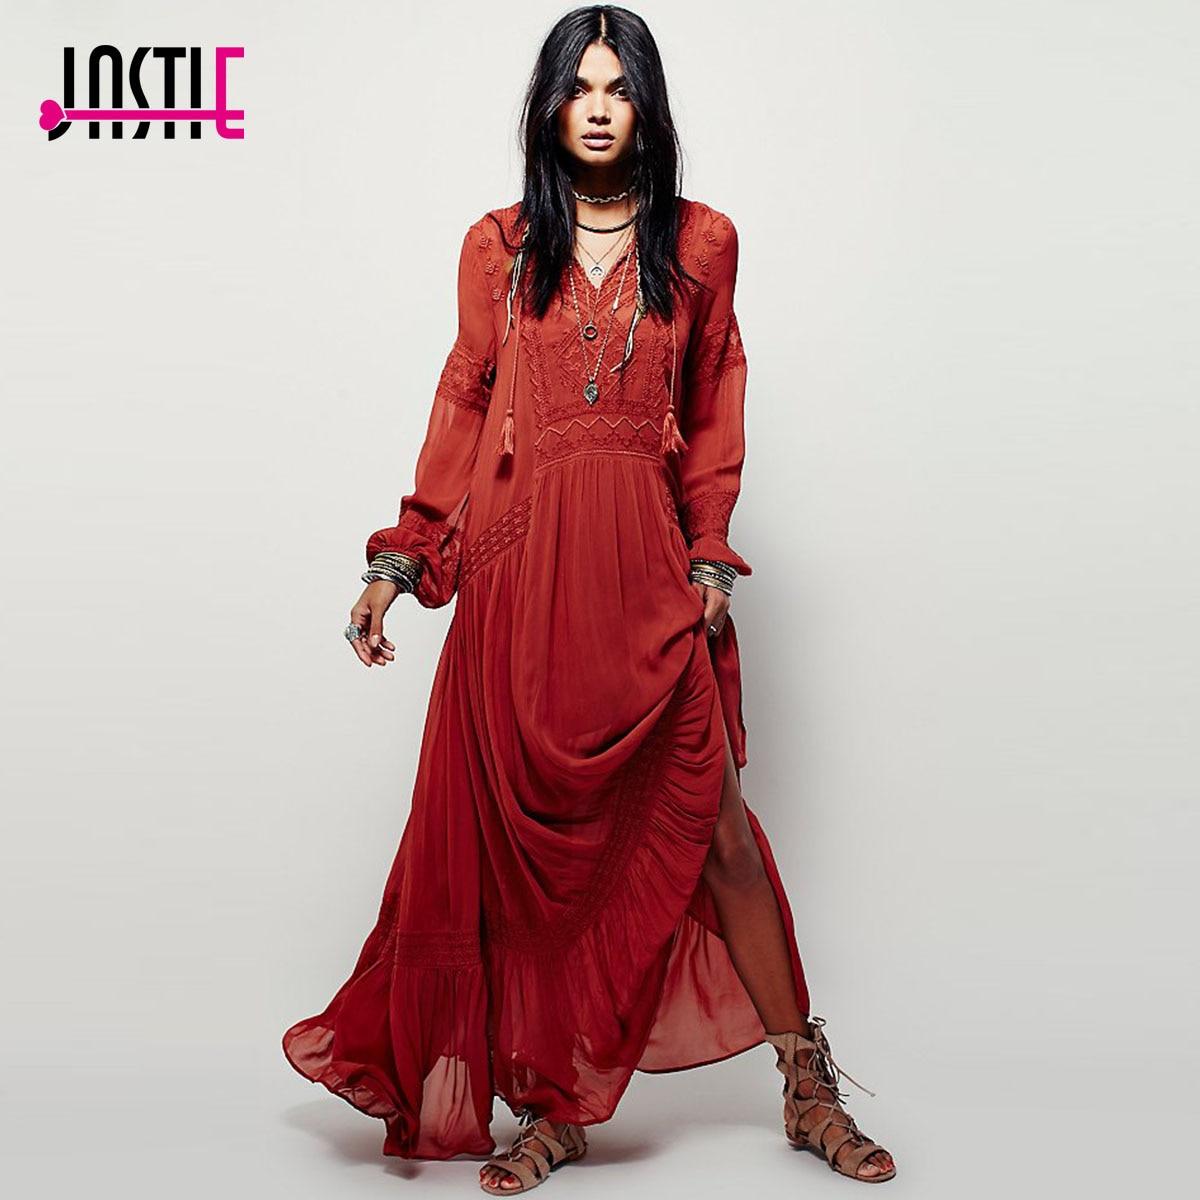 Jastie Women Dresses Elegant Ladies Vintage Long Sleeve Embroideried Orange Red Maxi Dress Vestidos Femininos Boho